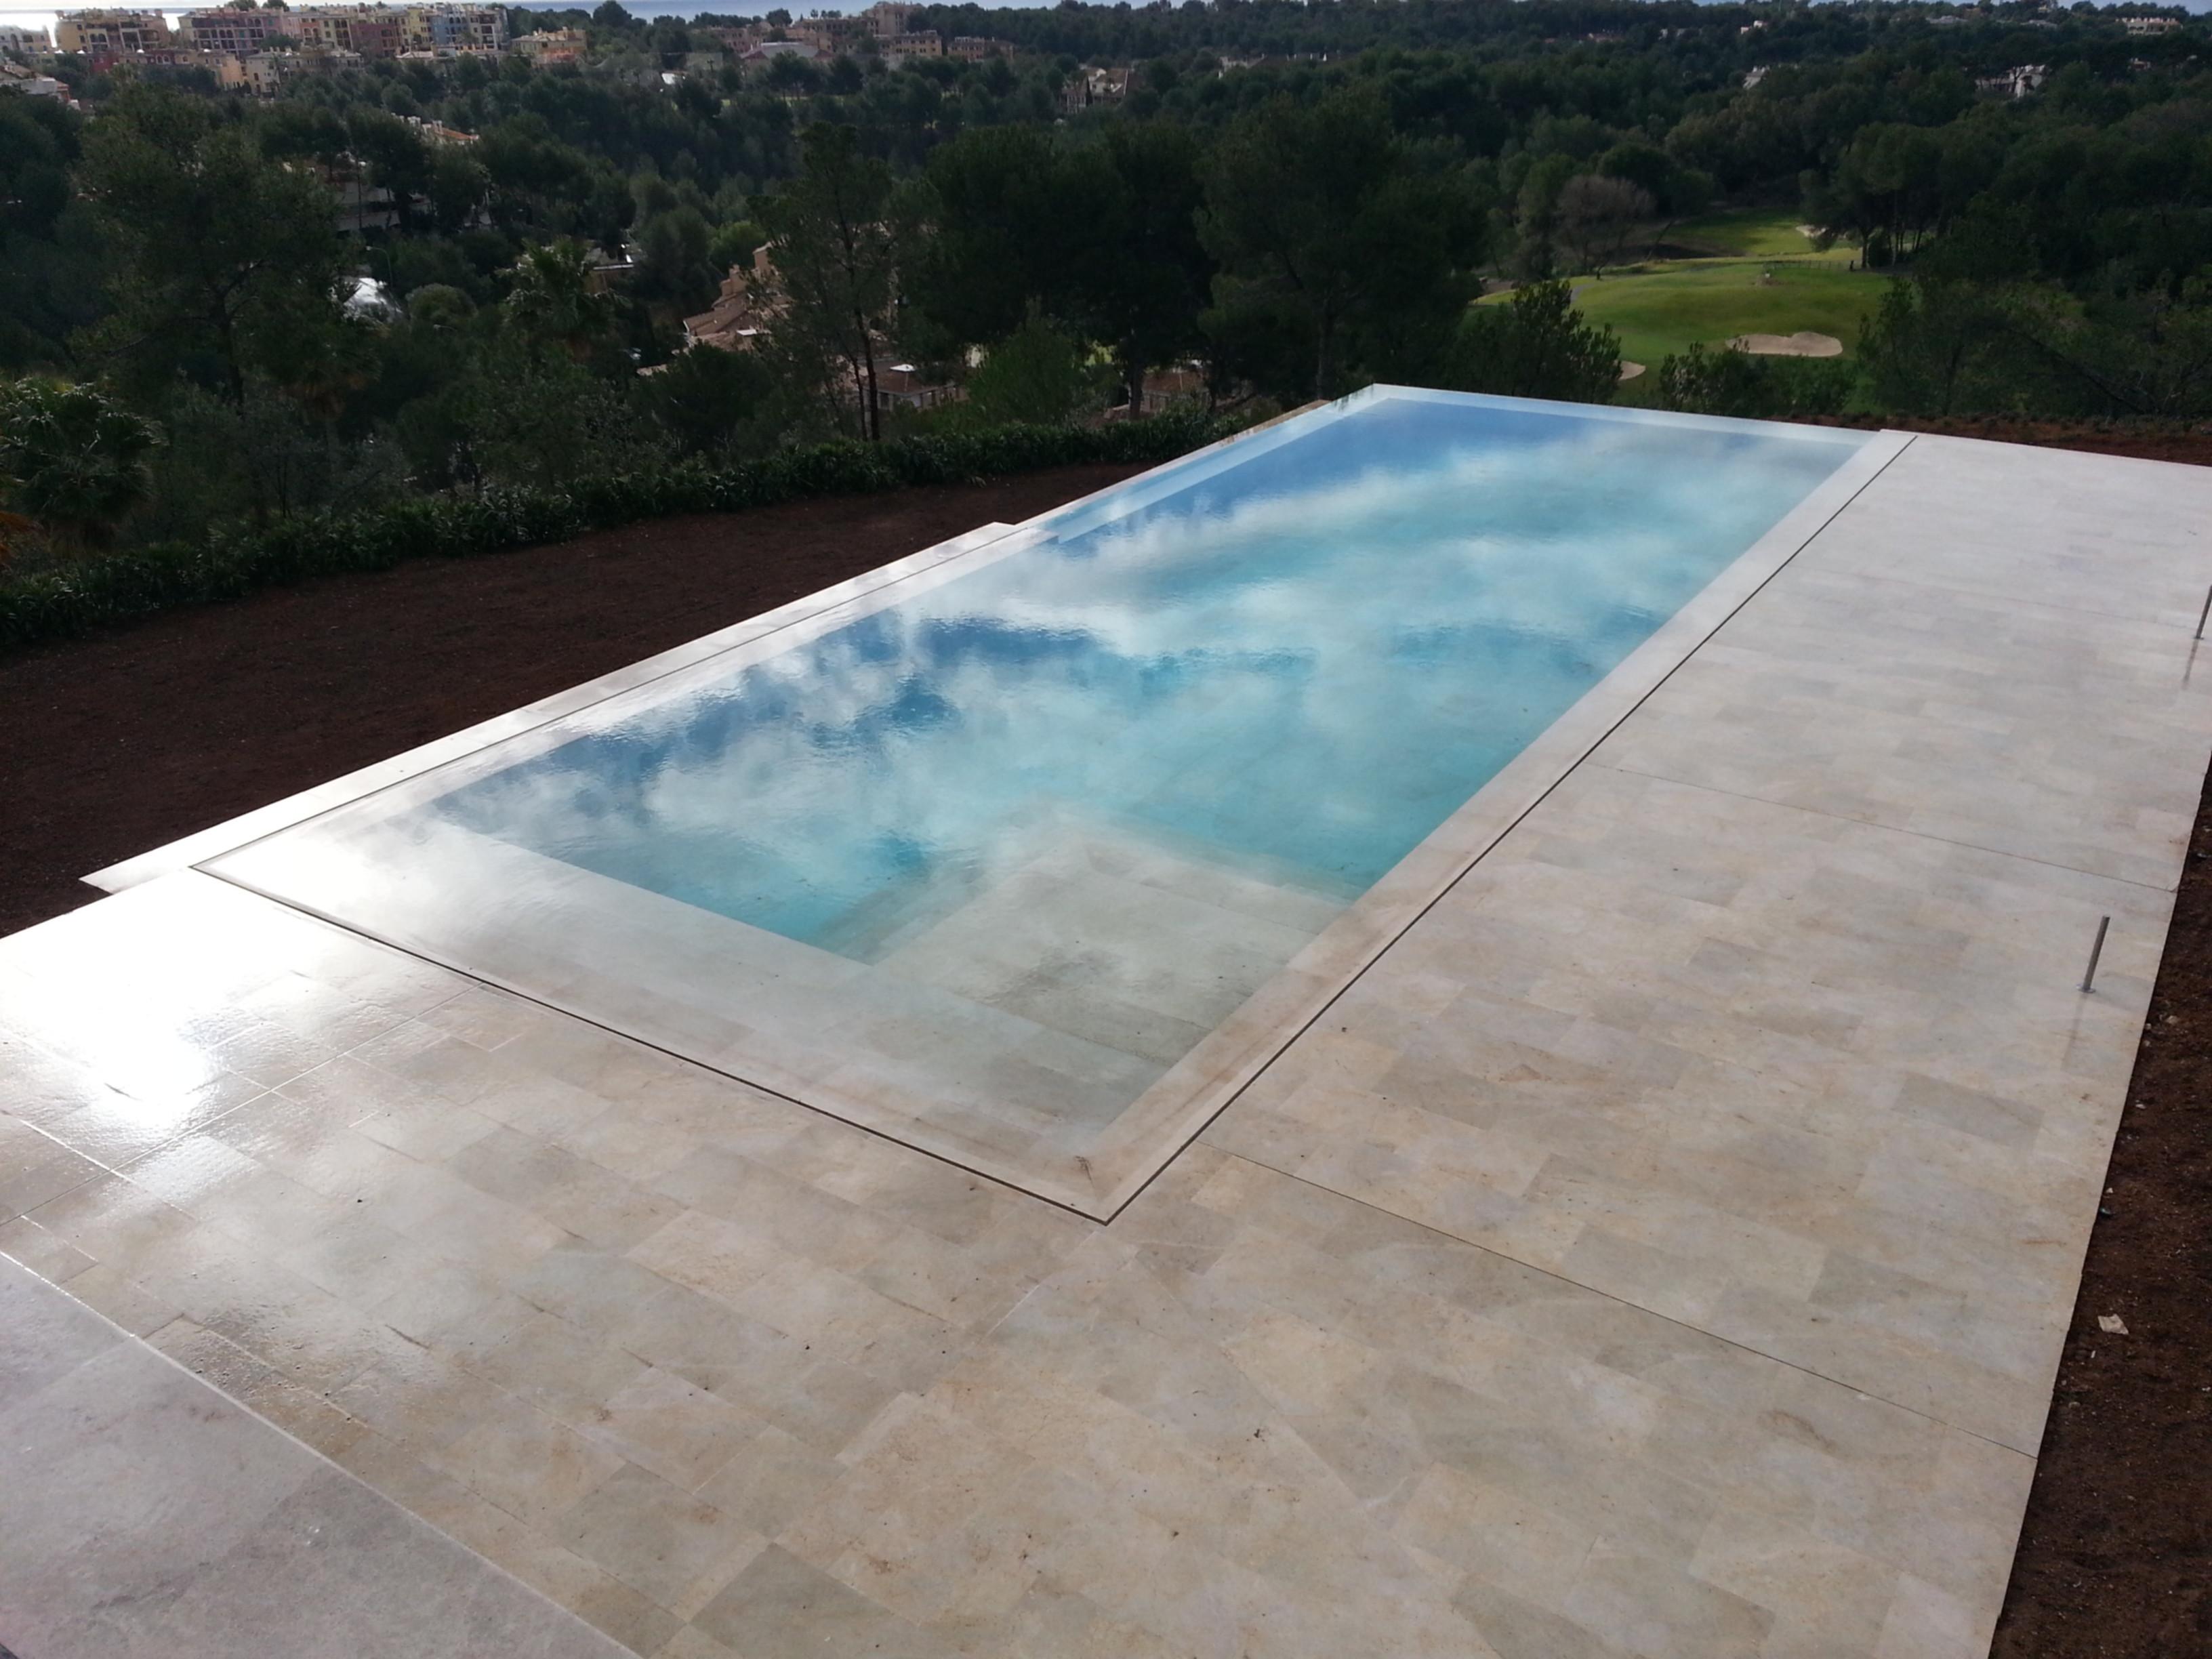 Tenemos las piscinas m s espectaculares for Piscinas desbordantes de diseno